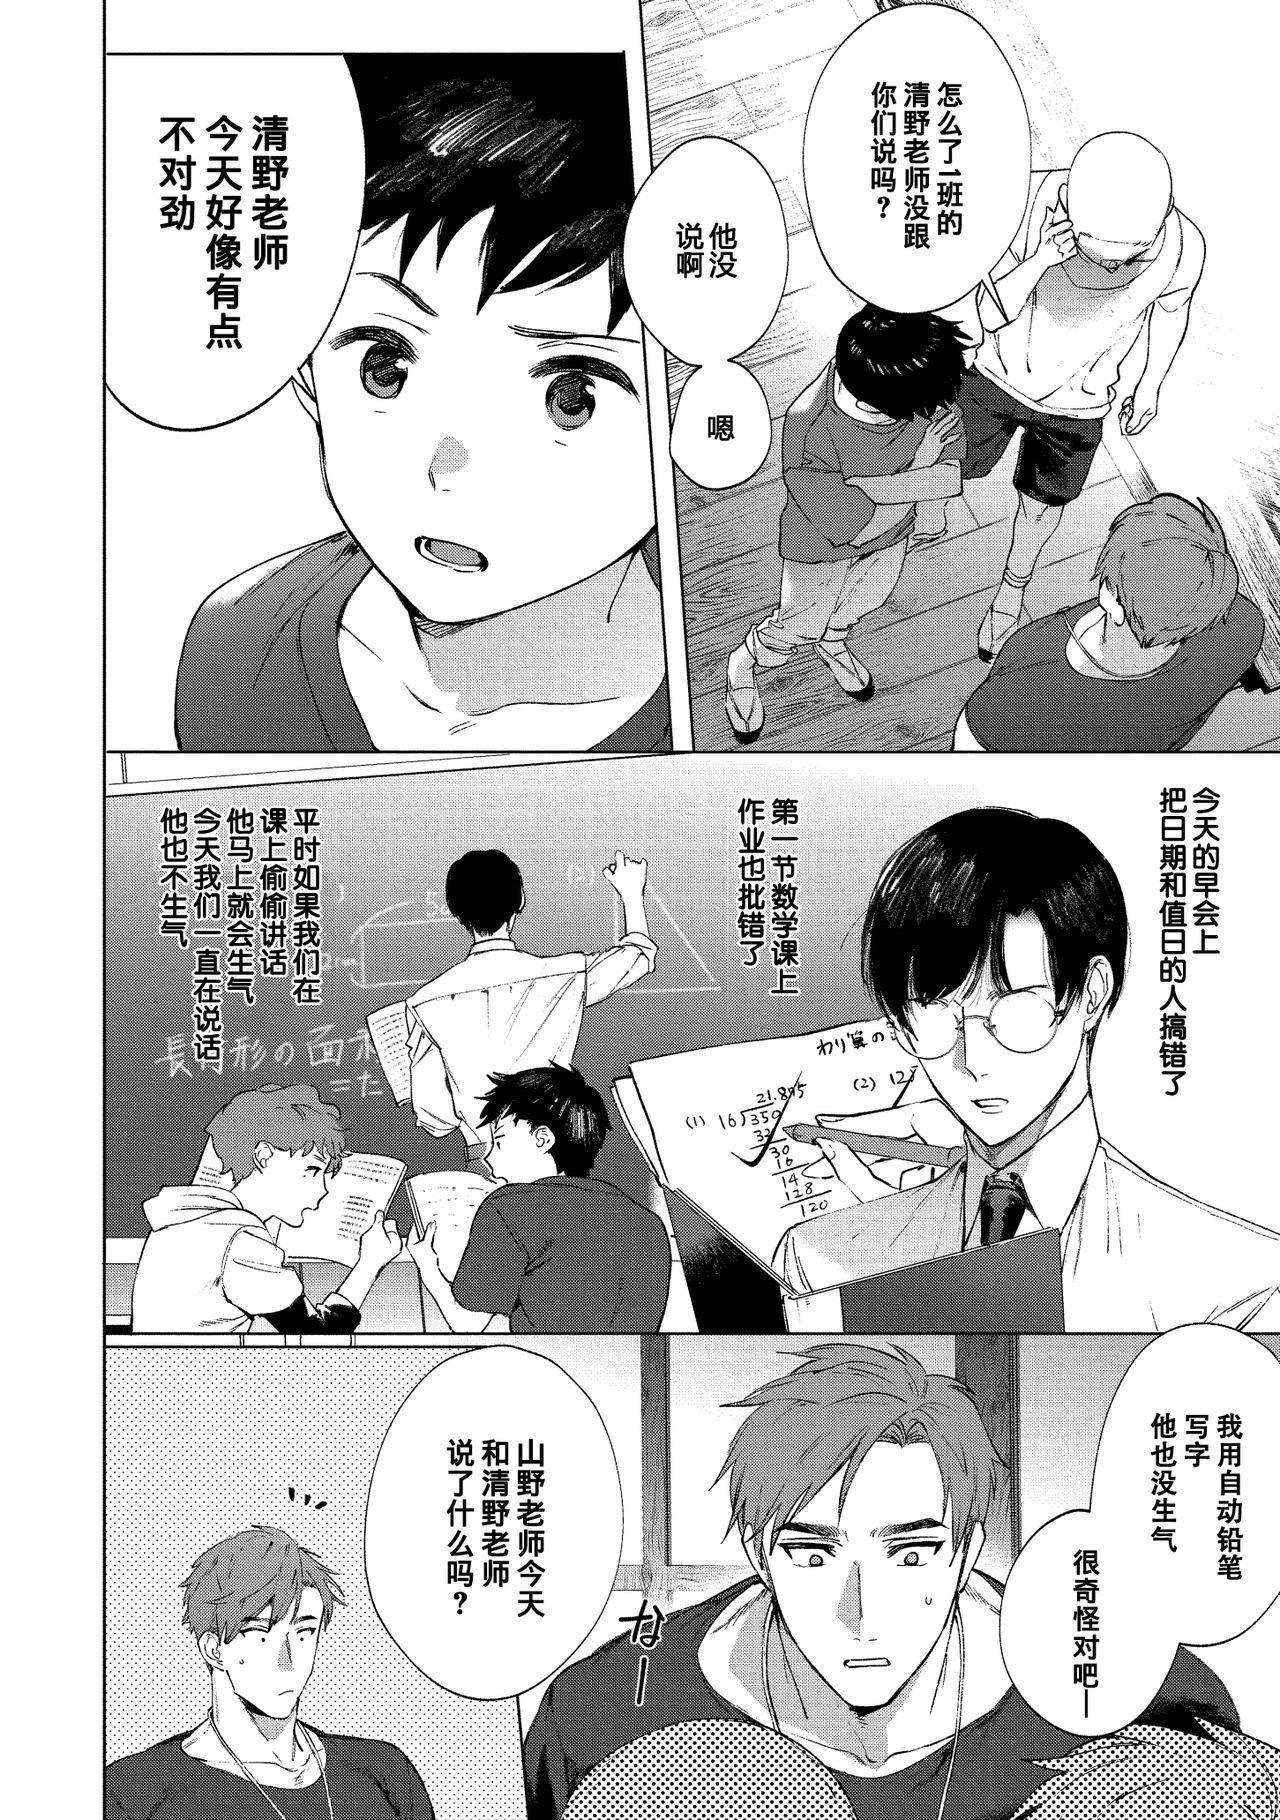 Sensei wa Benki ja Arimasen.3 | 老师不是便器。3 7